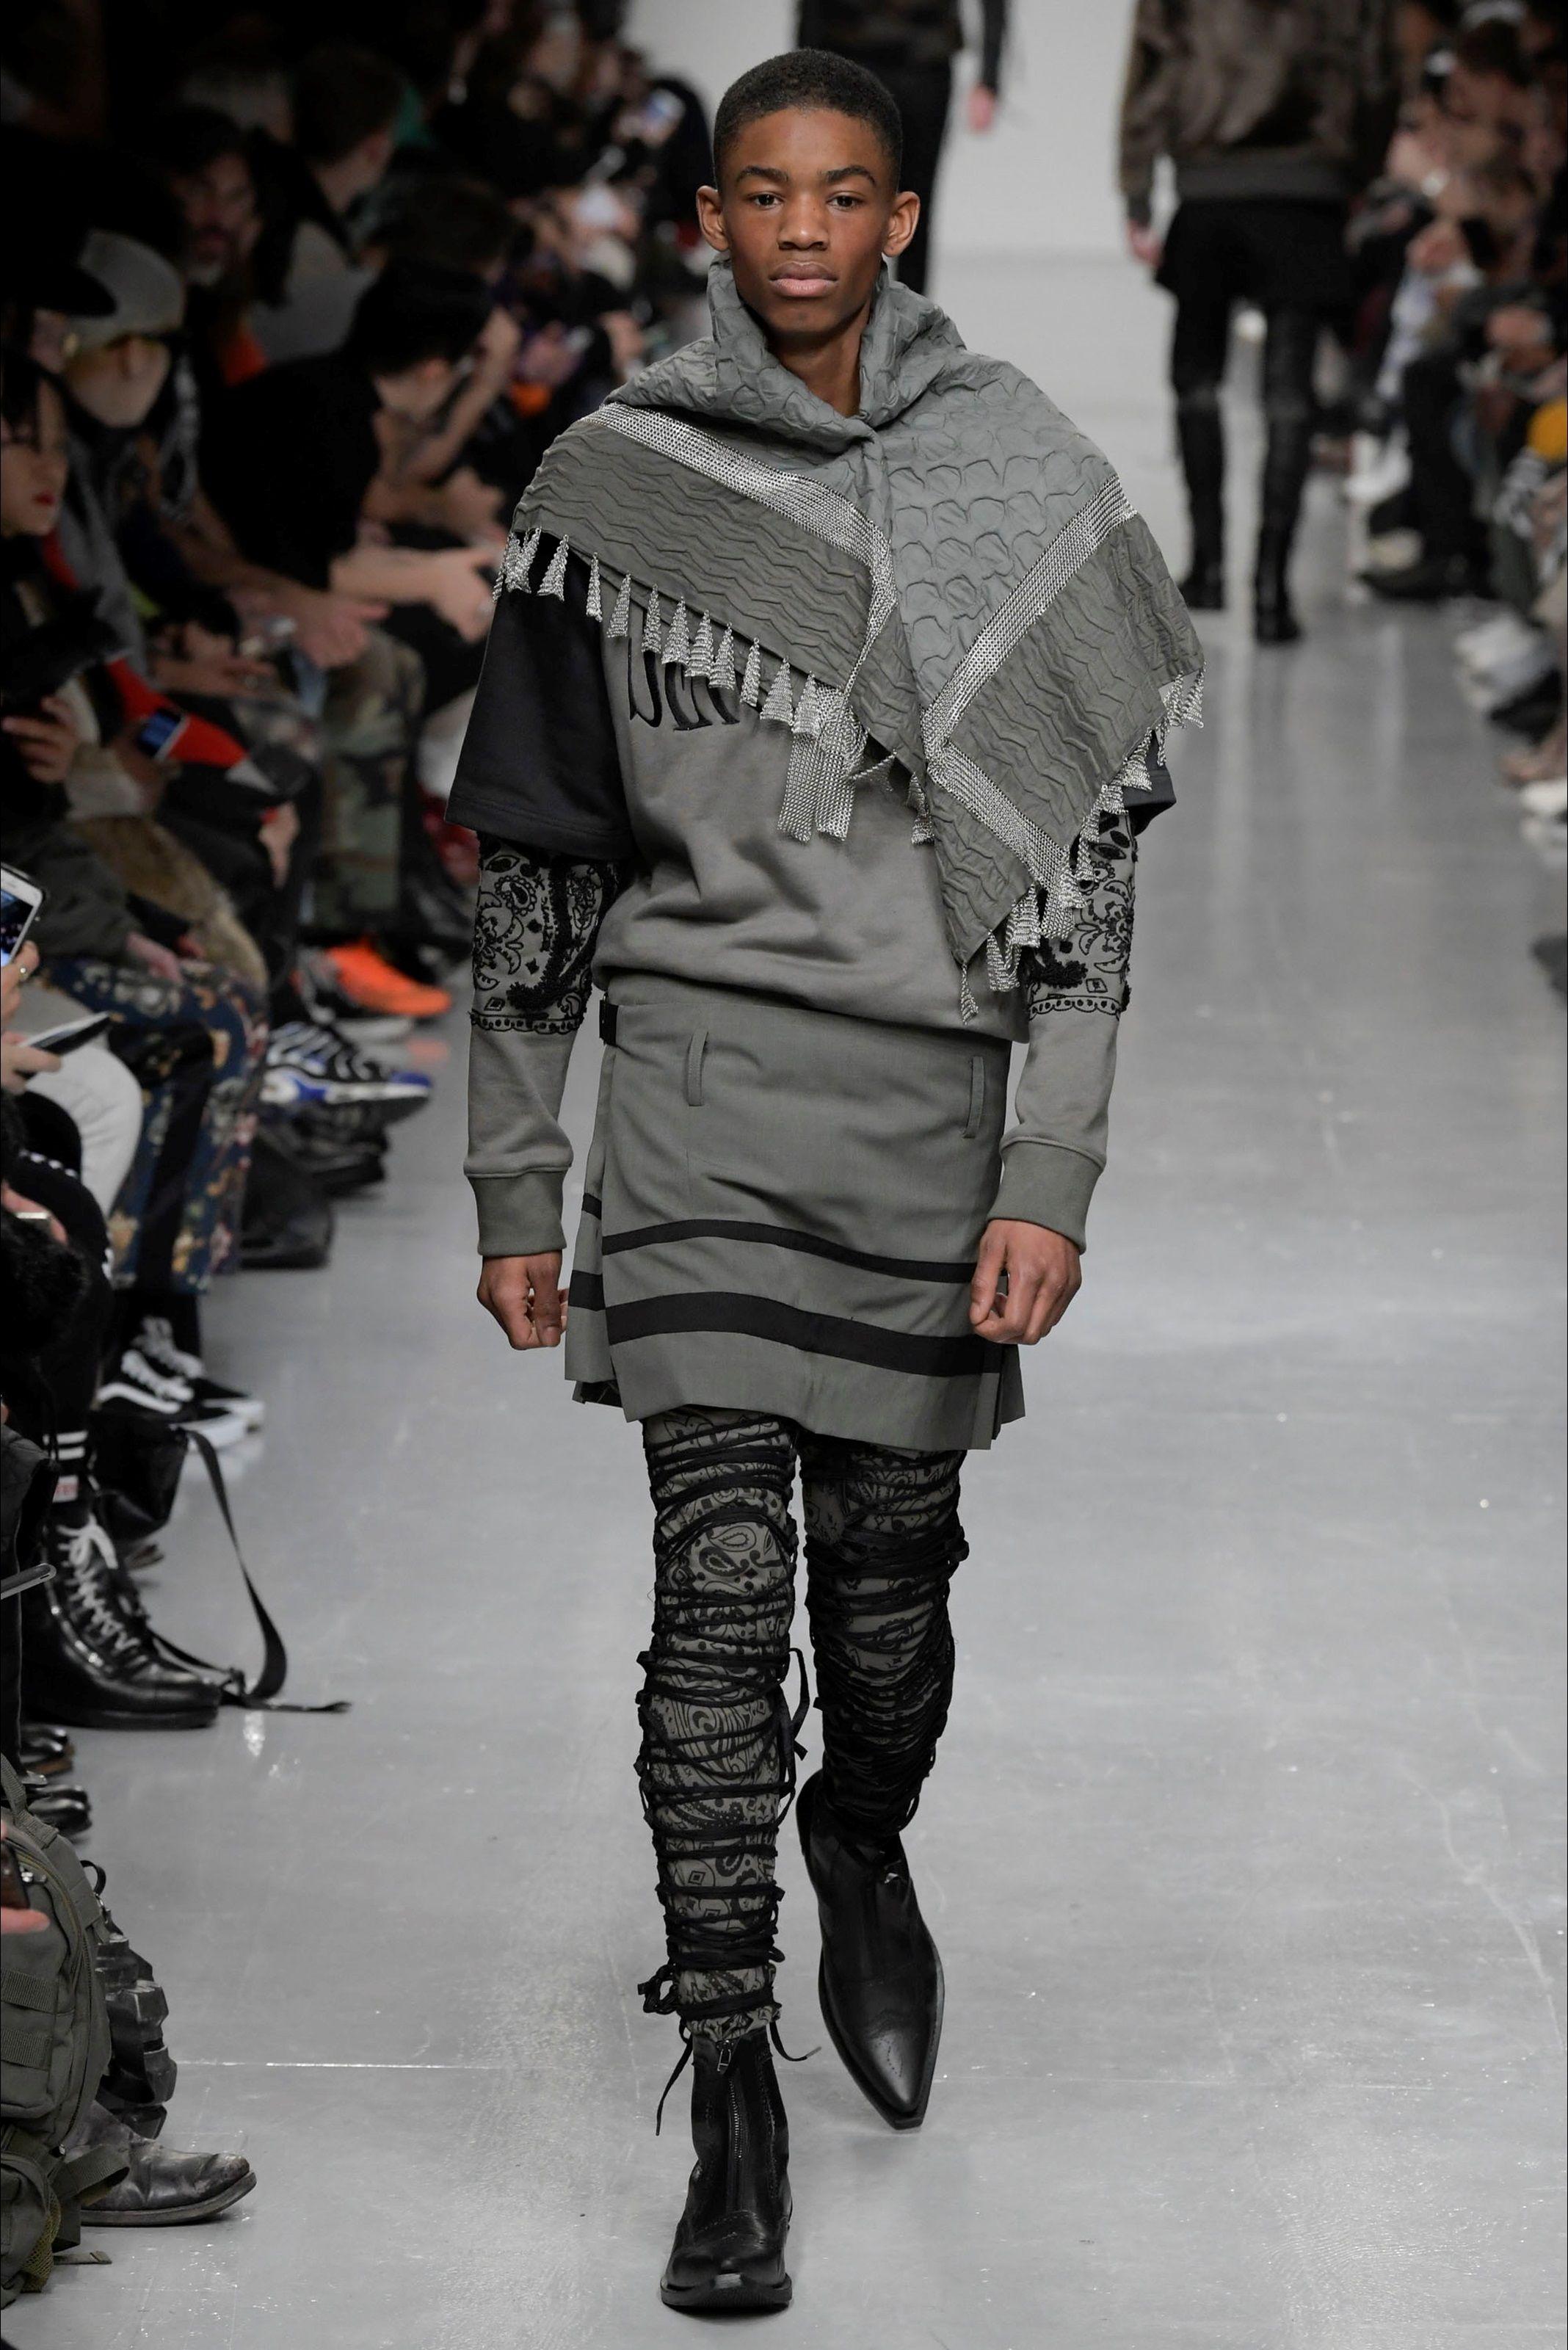 Sfilata Moda Uomo KTZ Londra - Autunno Inverno 2017-18 - Vogue